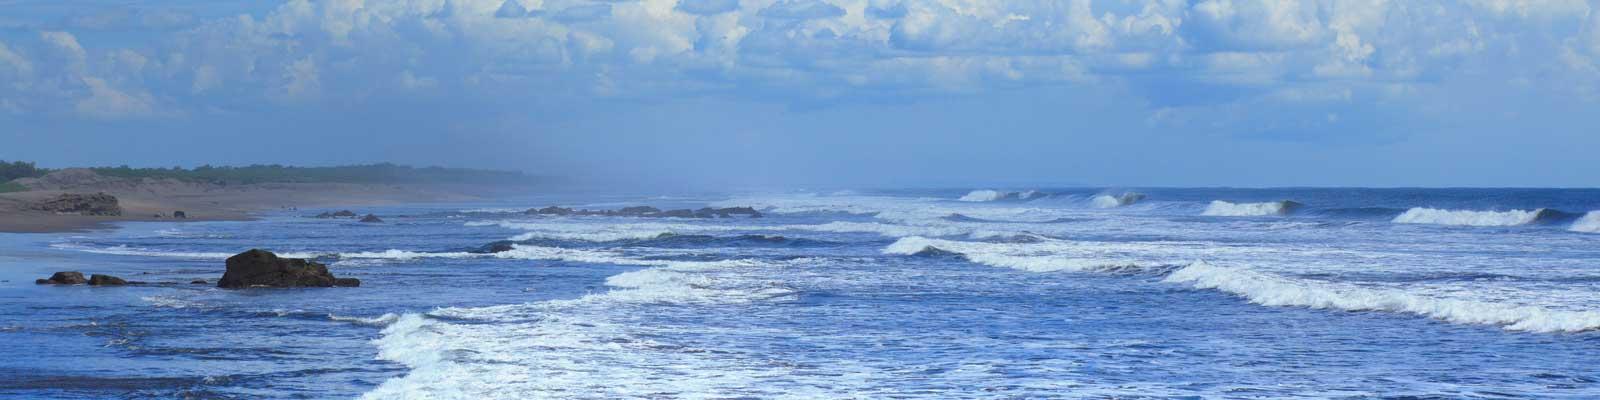 Nicaragua Immobili - Case, appartamenti, ville - Compra, Affitta, Investi